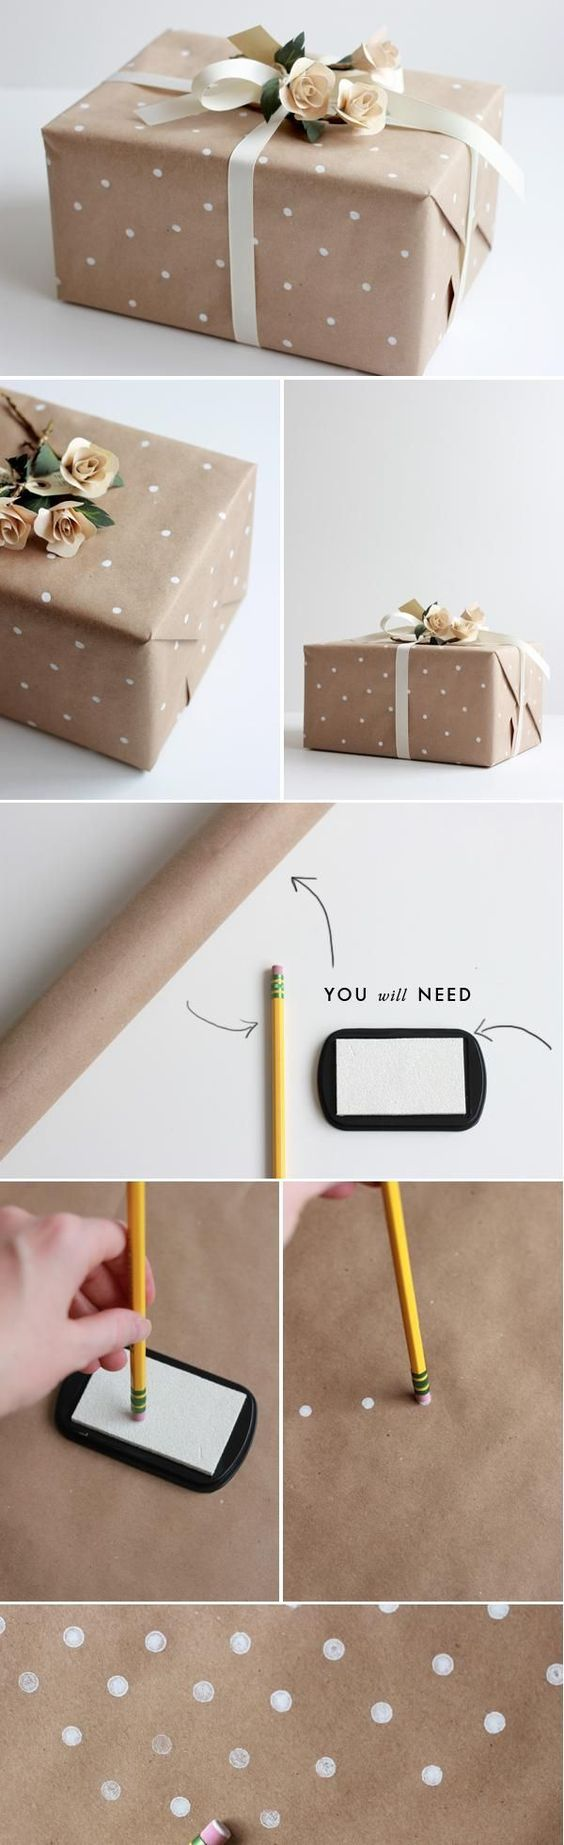 emballage feminin noel